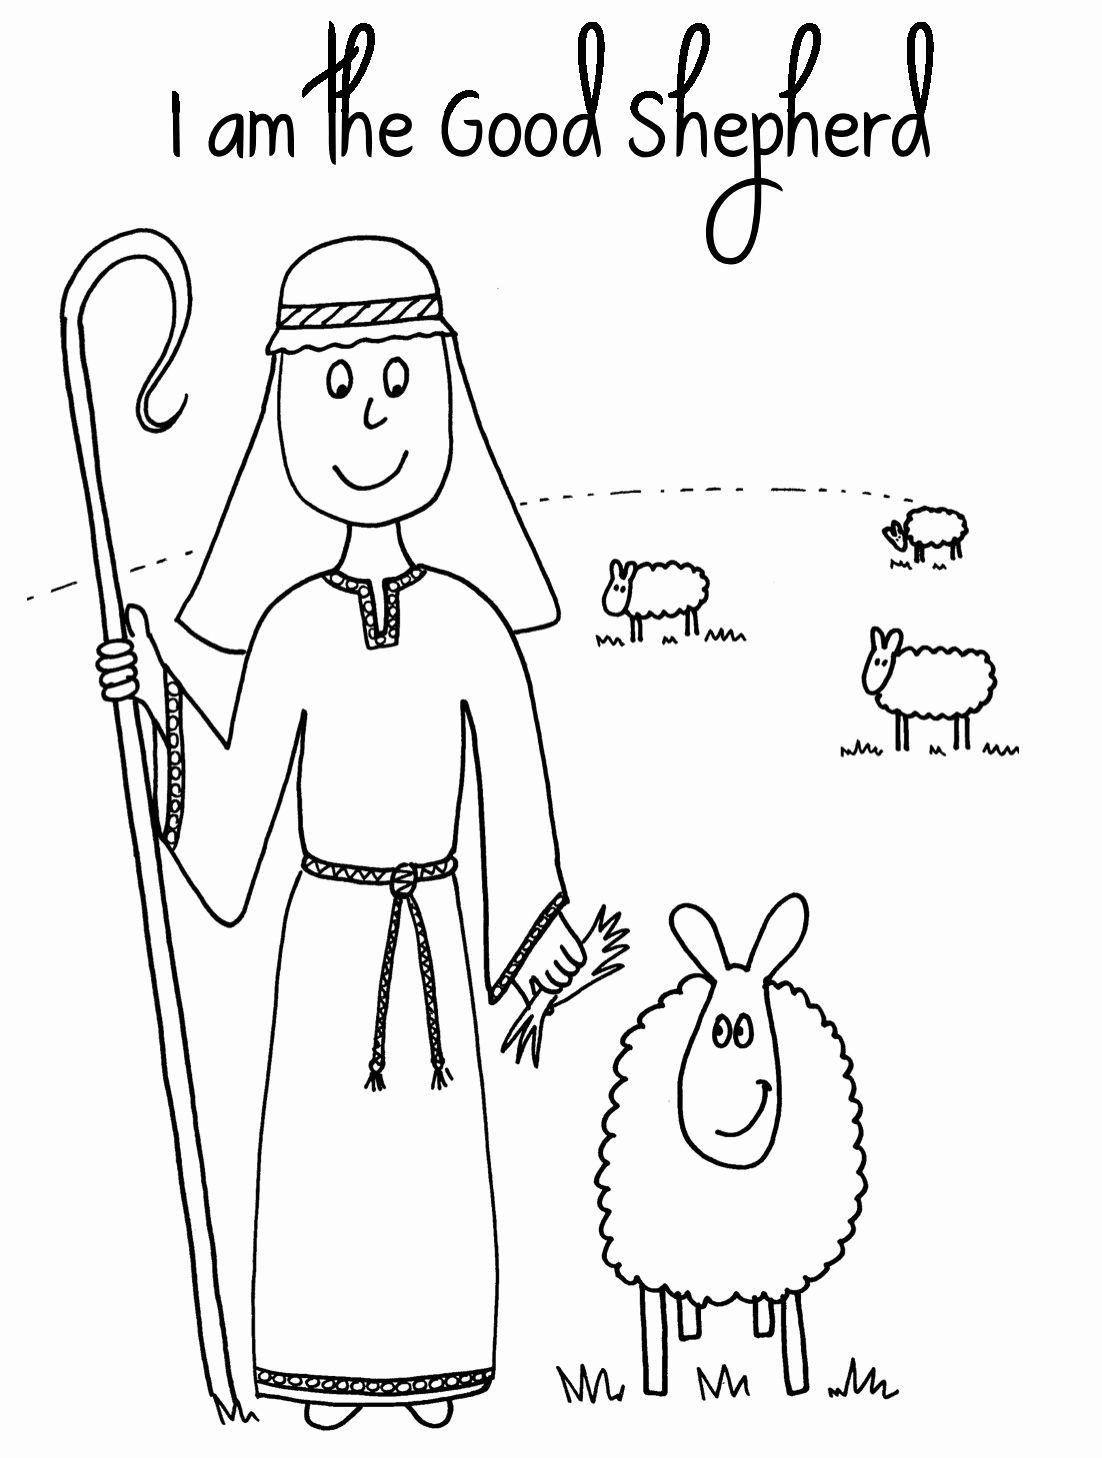 Nceyk9m7i Coloring Pages Free Printable Disney Good Shepherd ... | 1458x1102